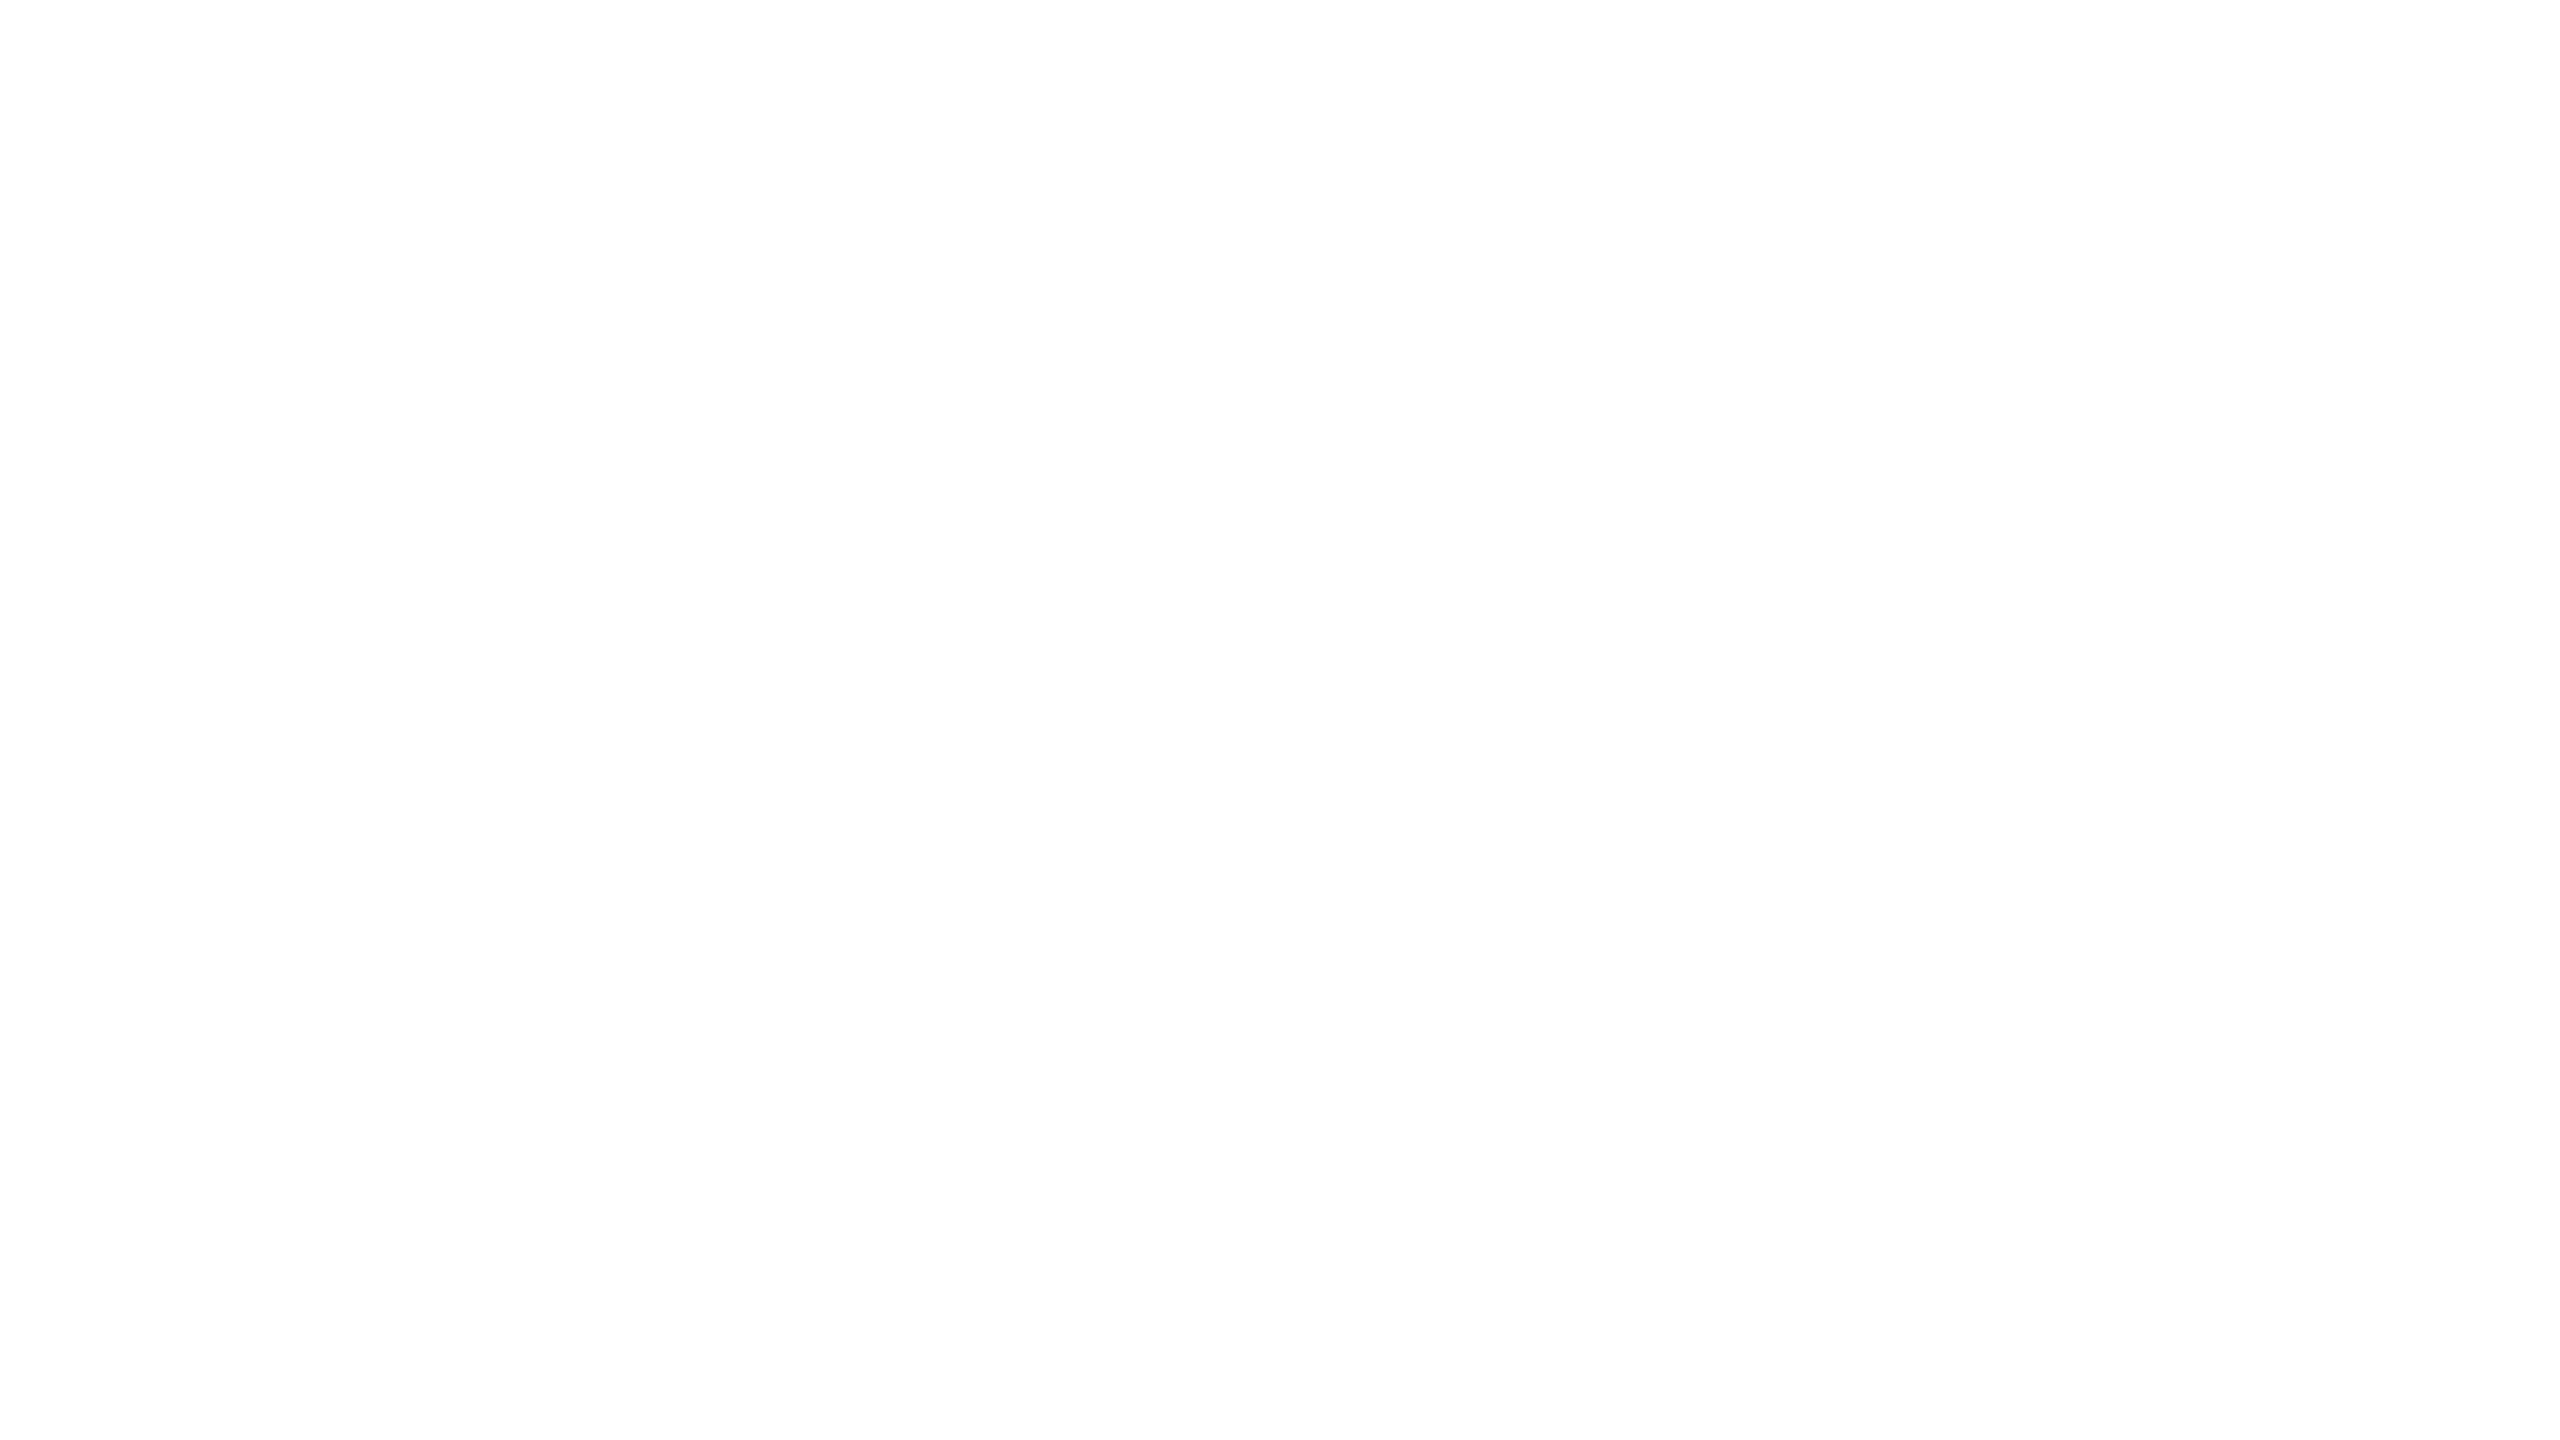 1080 Pixel White Dracos